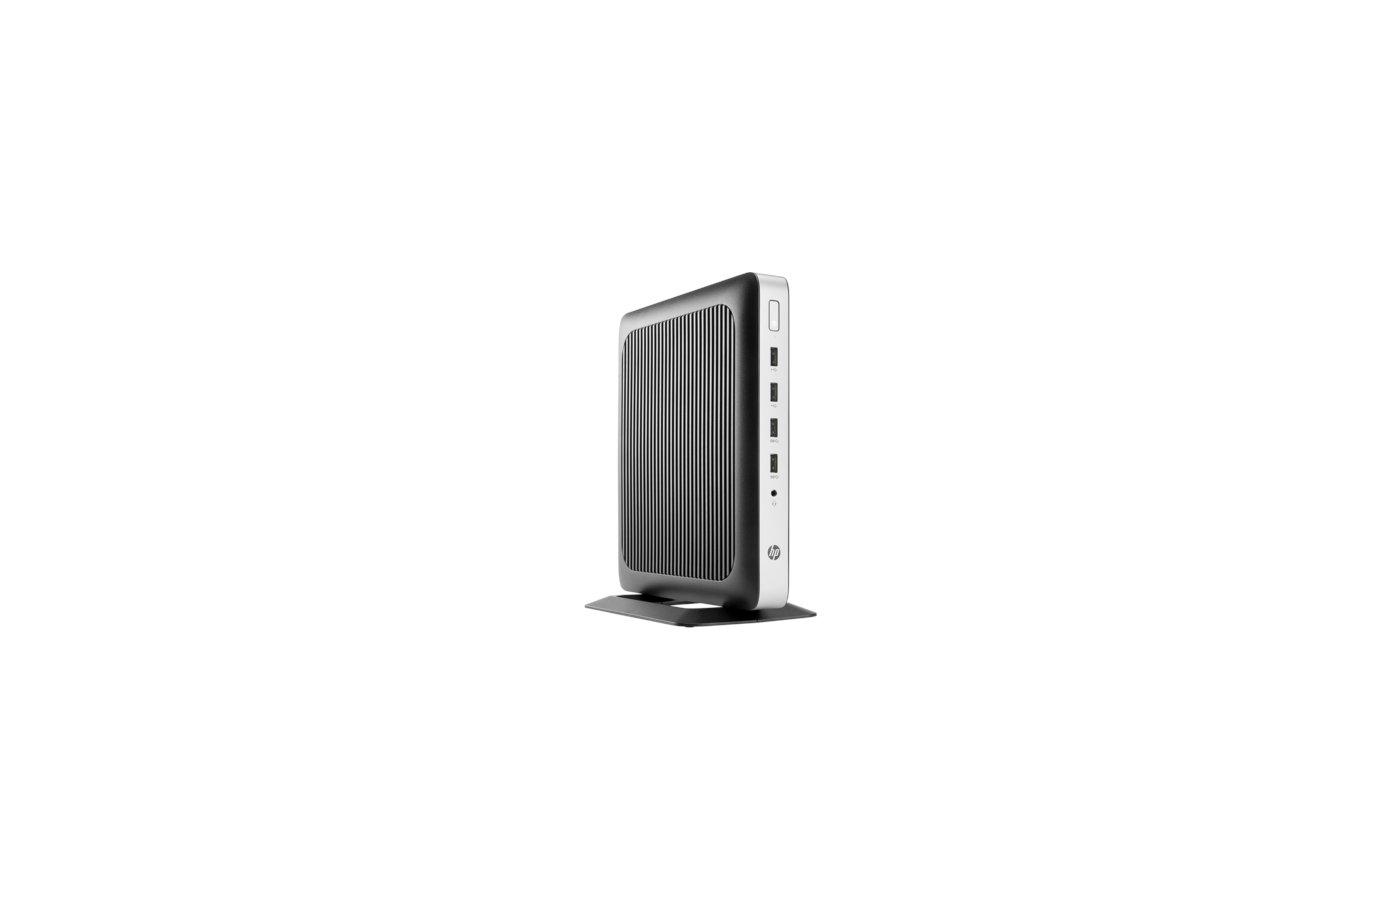 Системный блок HP T630 /X4X18AA/